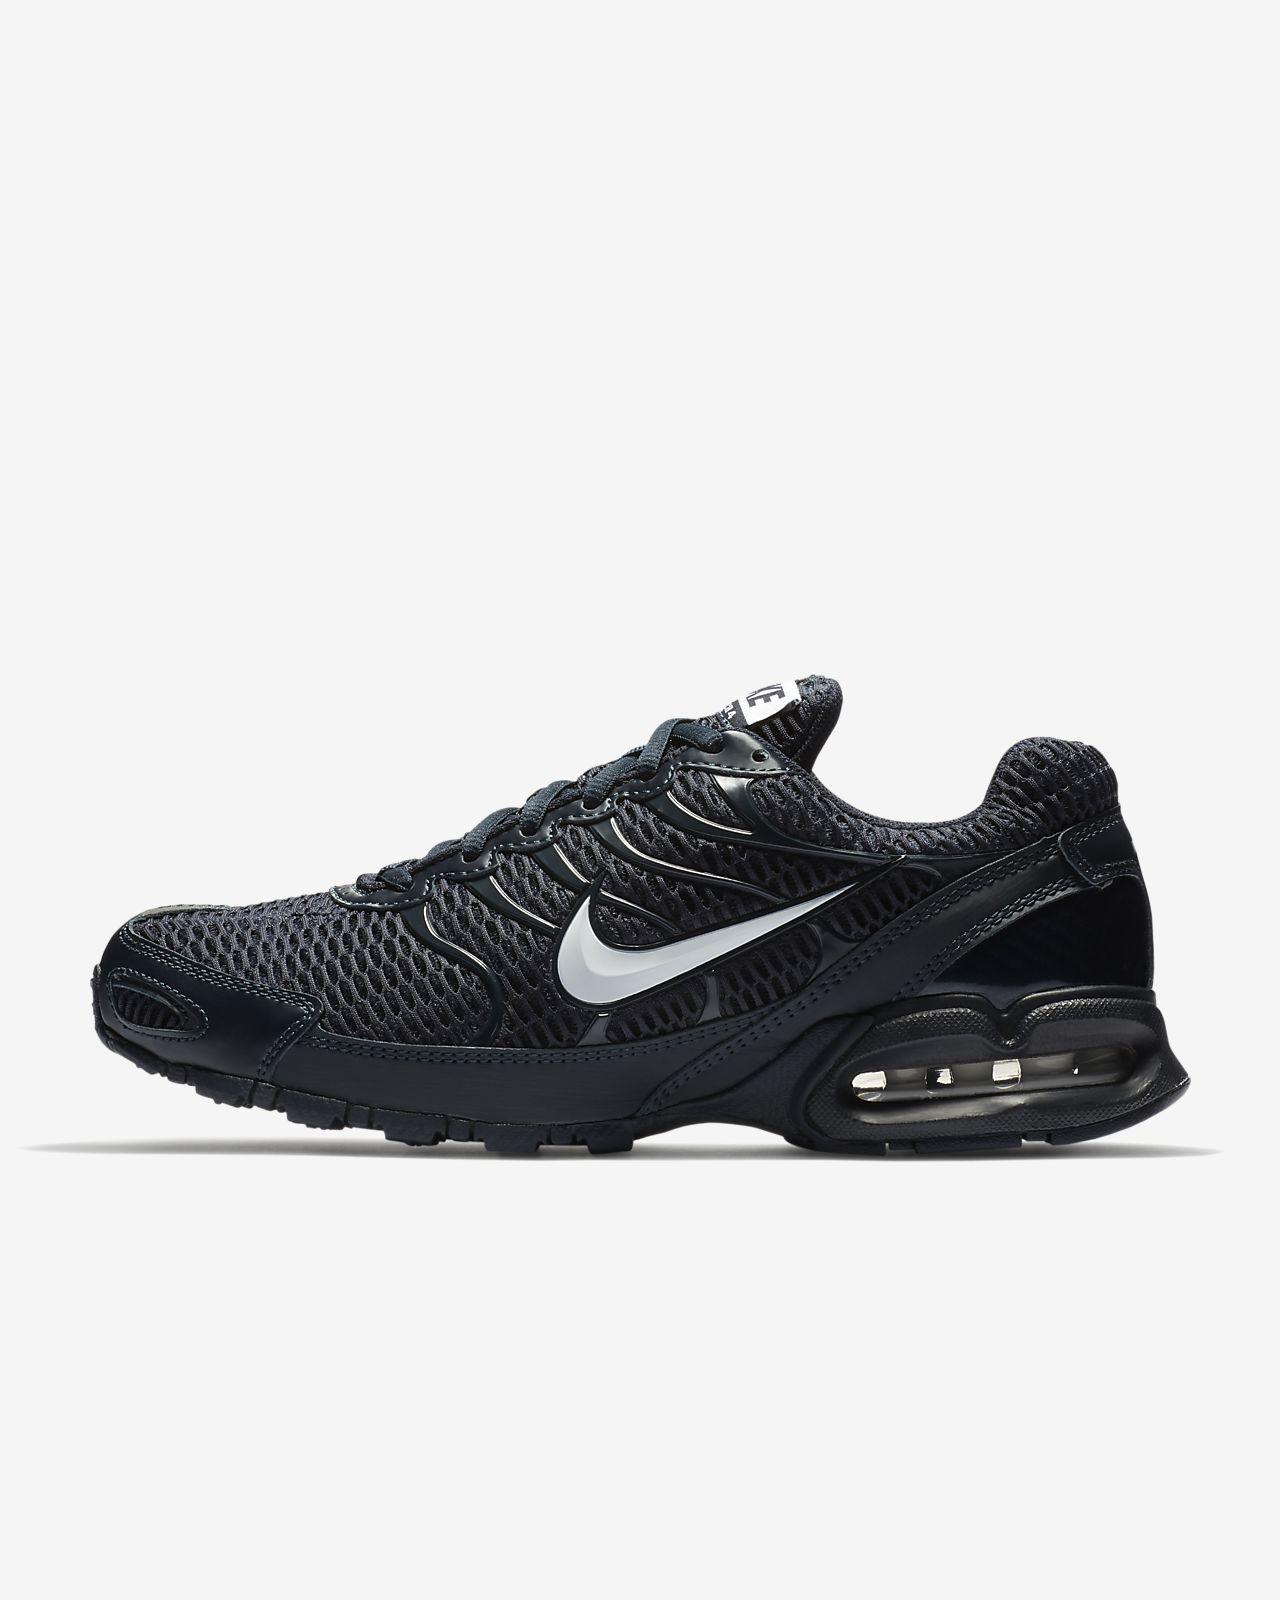 Nike Air Max Torch 4 Men's Running Shoe